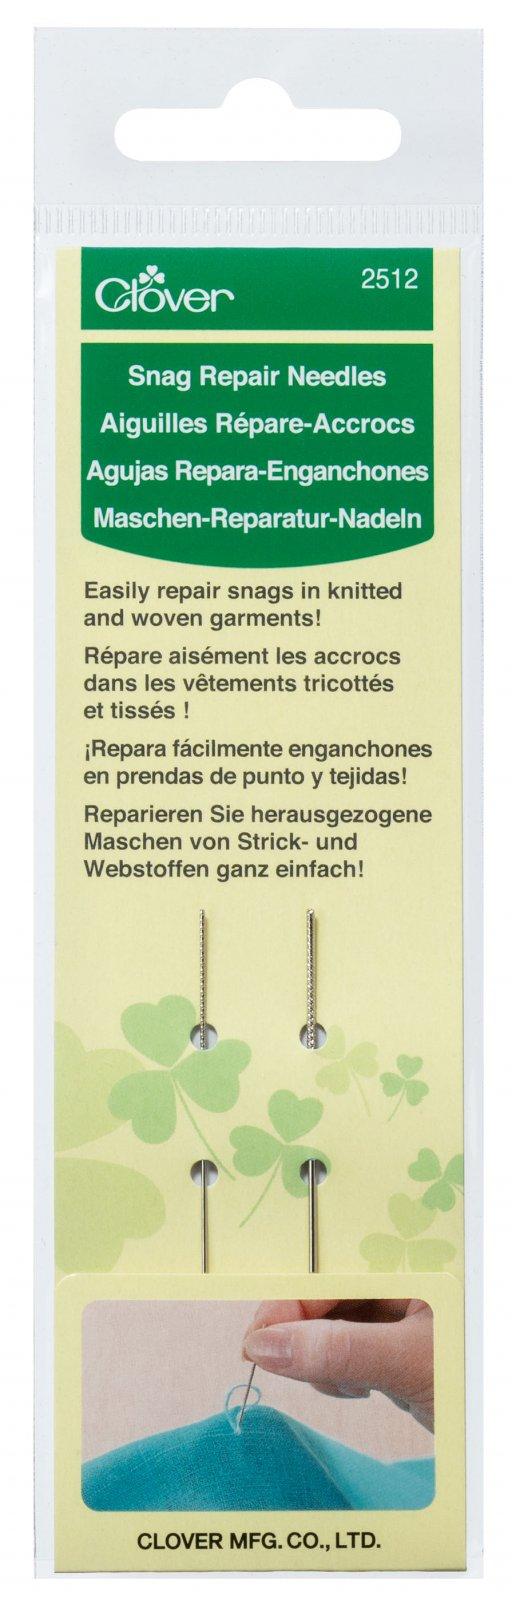 Clover - 2512 Snag Repair Needle